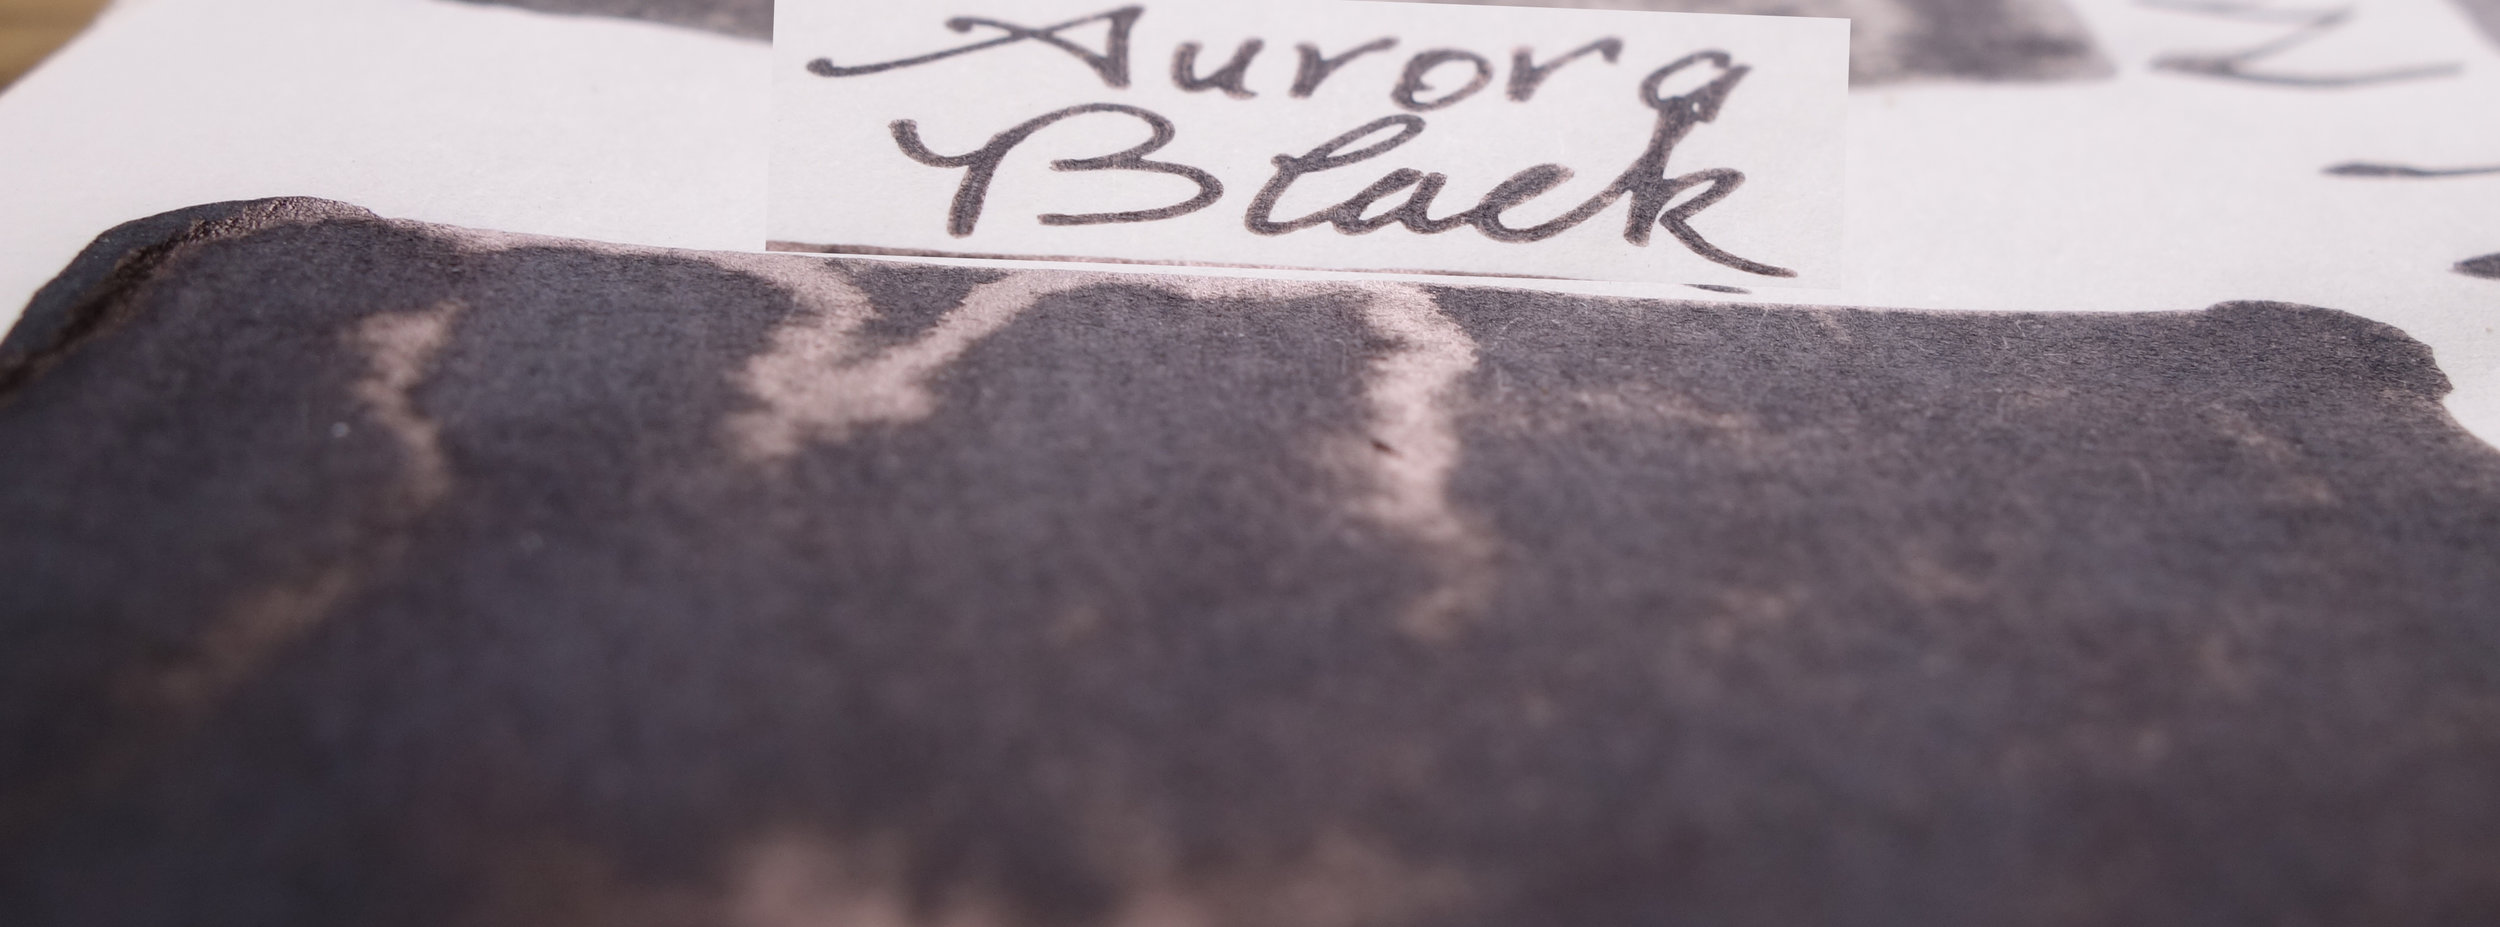 Aurora Black (Tomoe River)